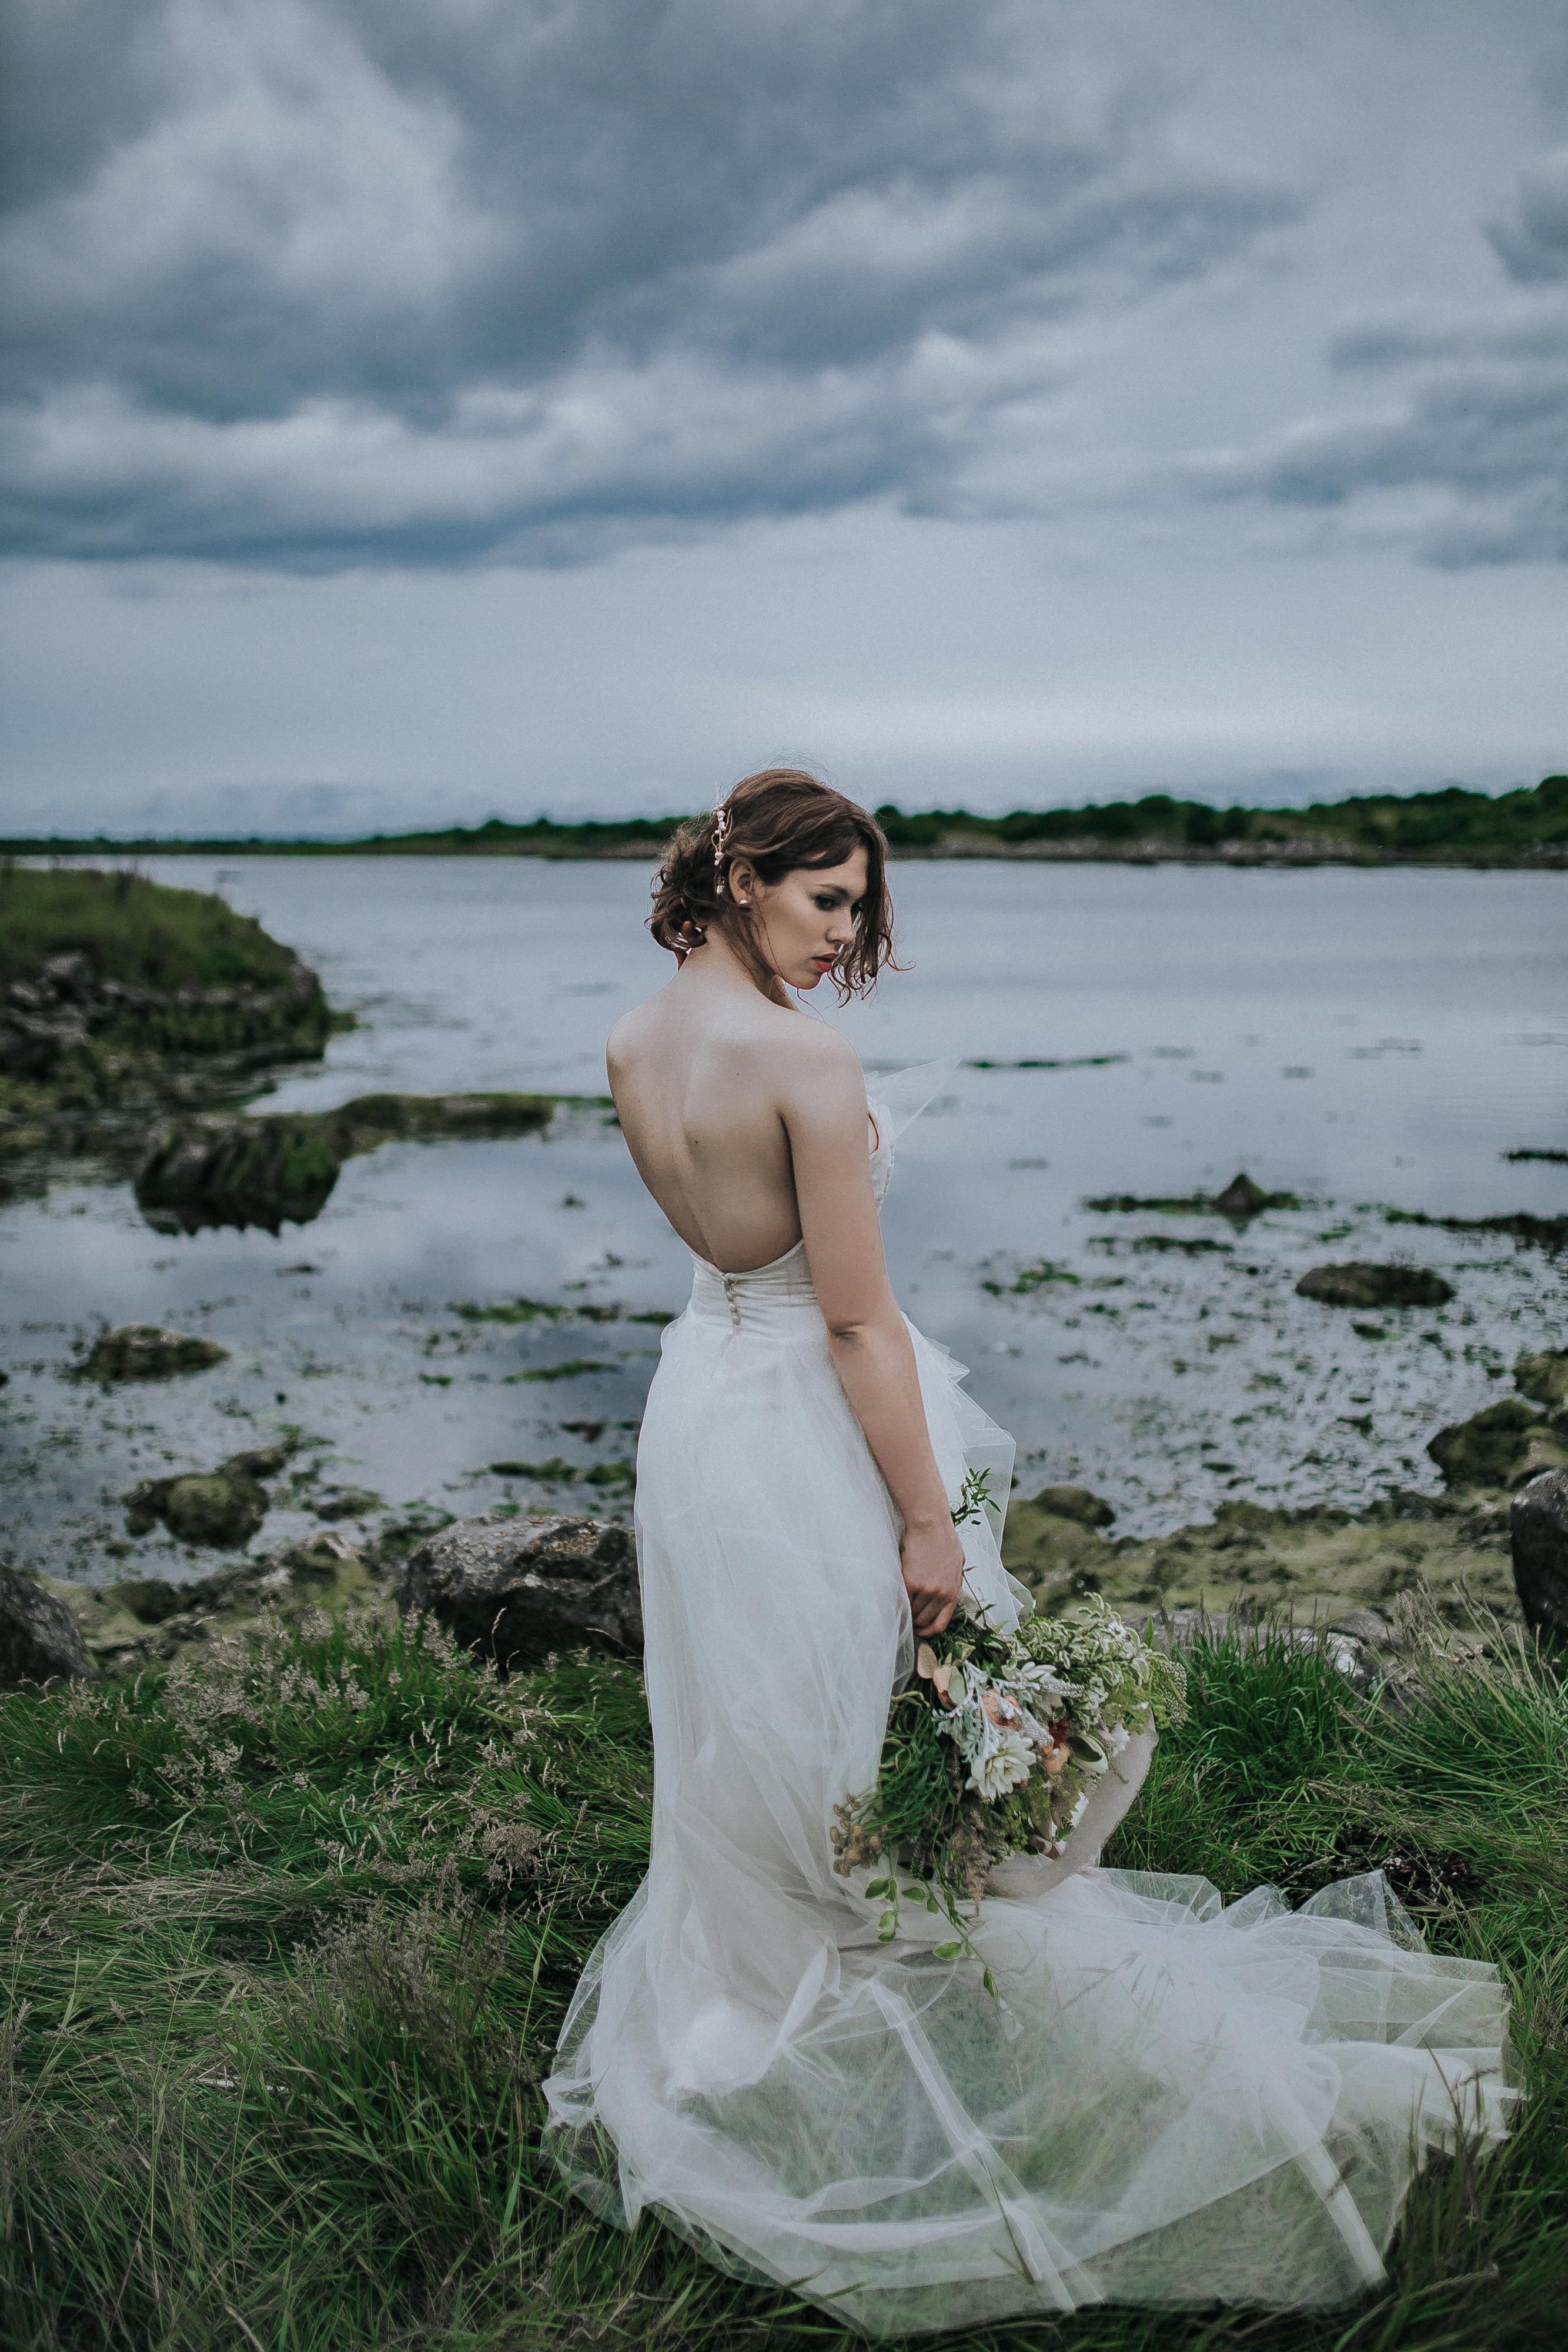 Bridal   Galway, Ireland Elopement Photographer • Shuttergram Portraits